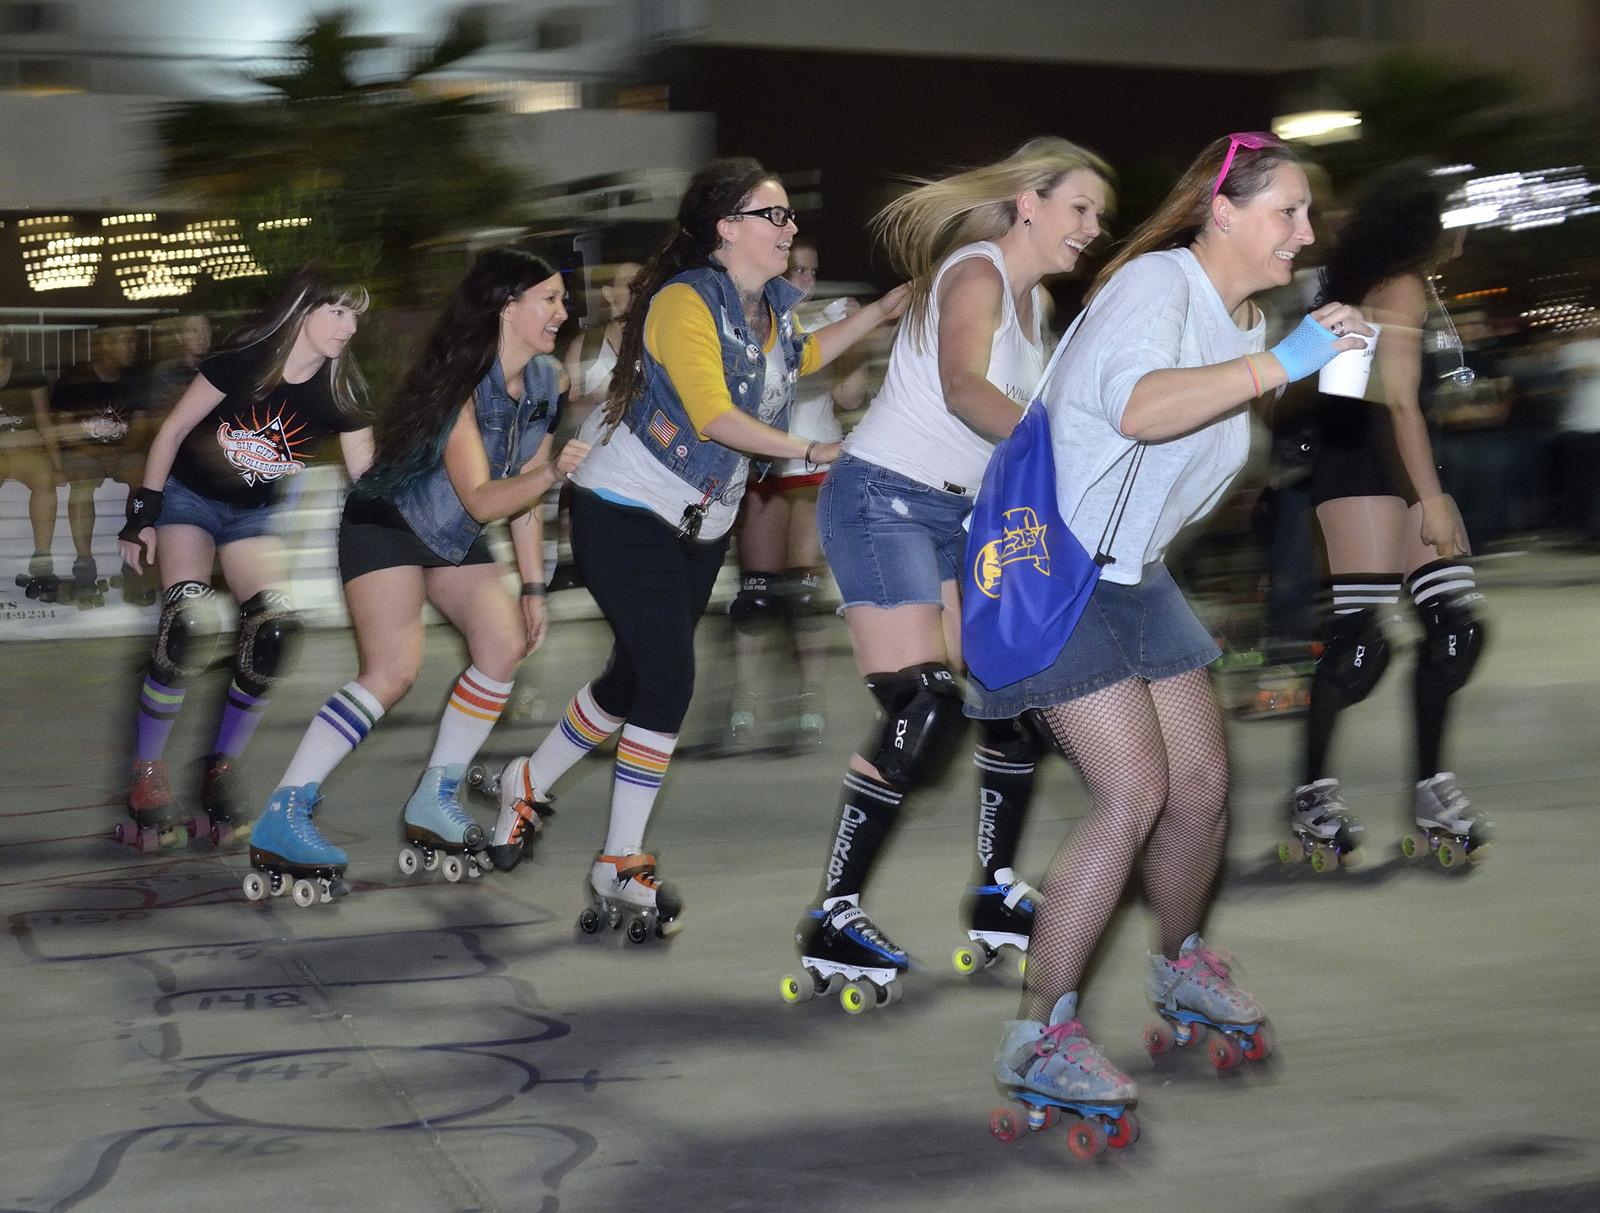 Roller skates las vegas - Roller Disco Down Derby Is A Lively Nightlife Alternative Las Vegas Weekly